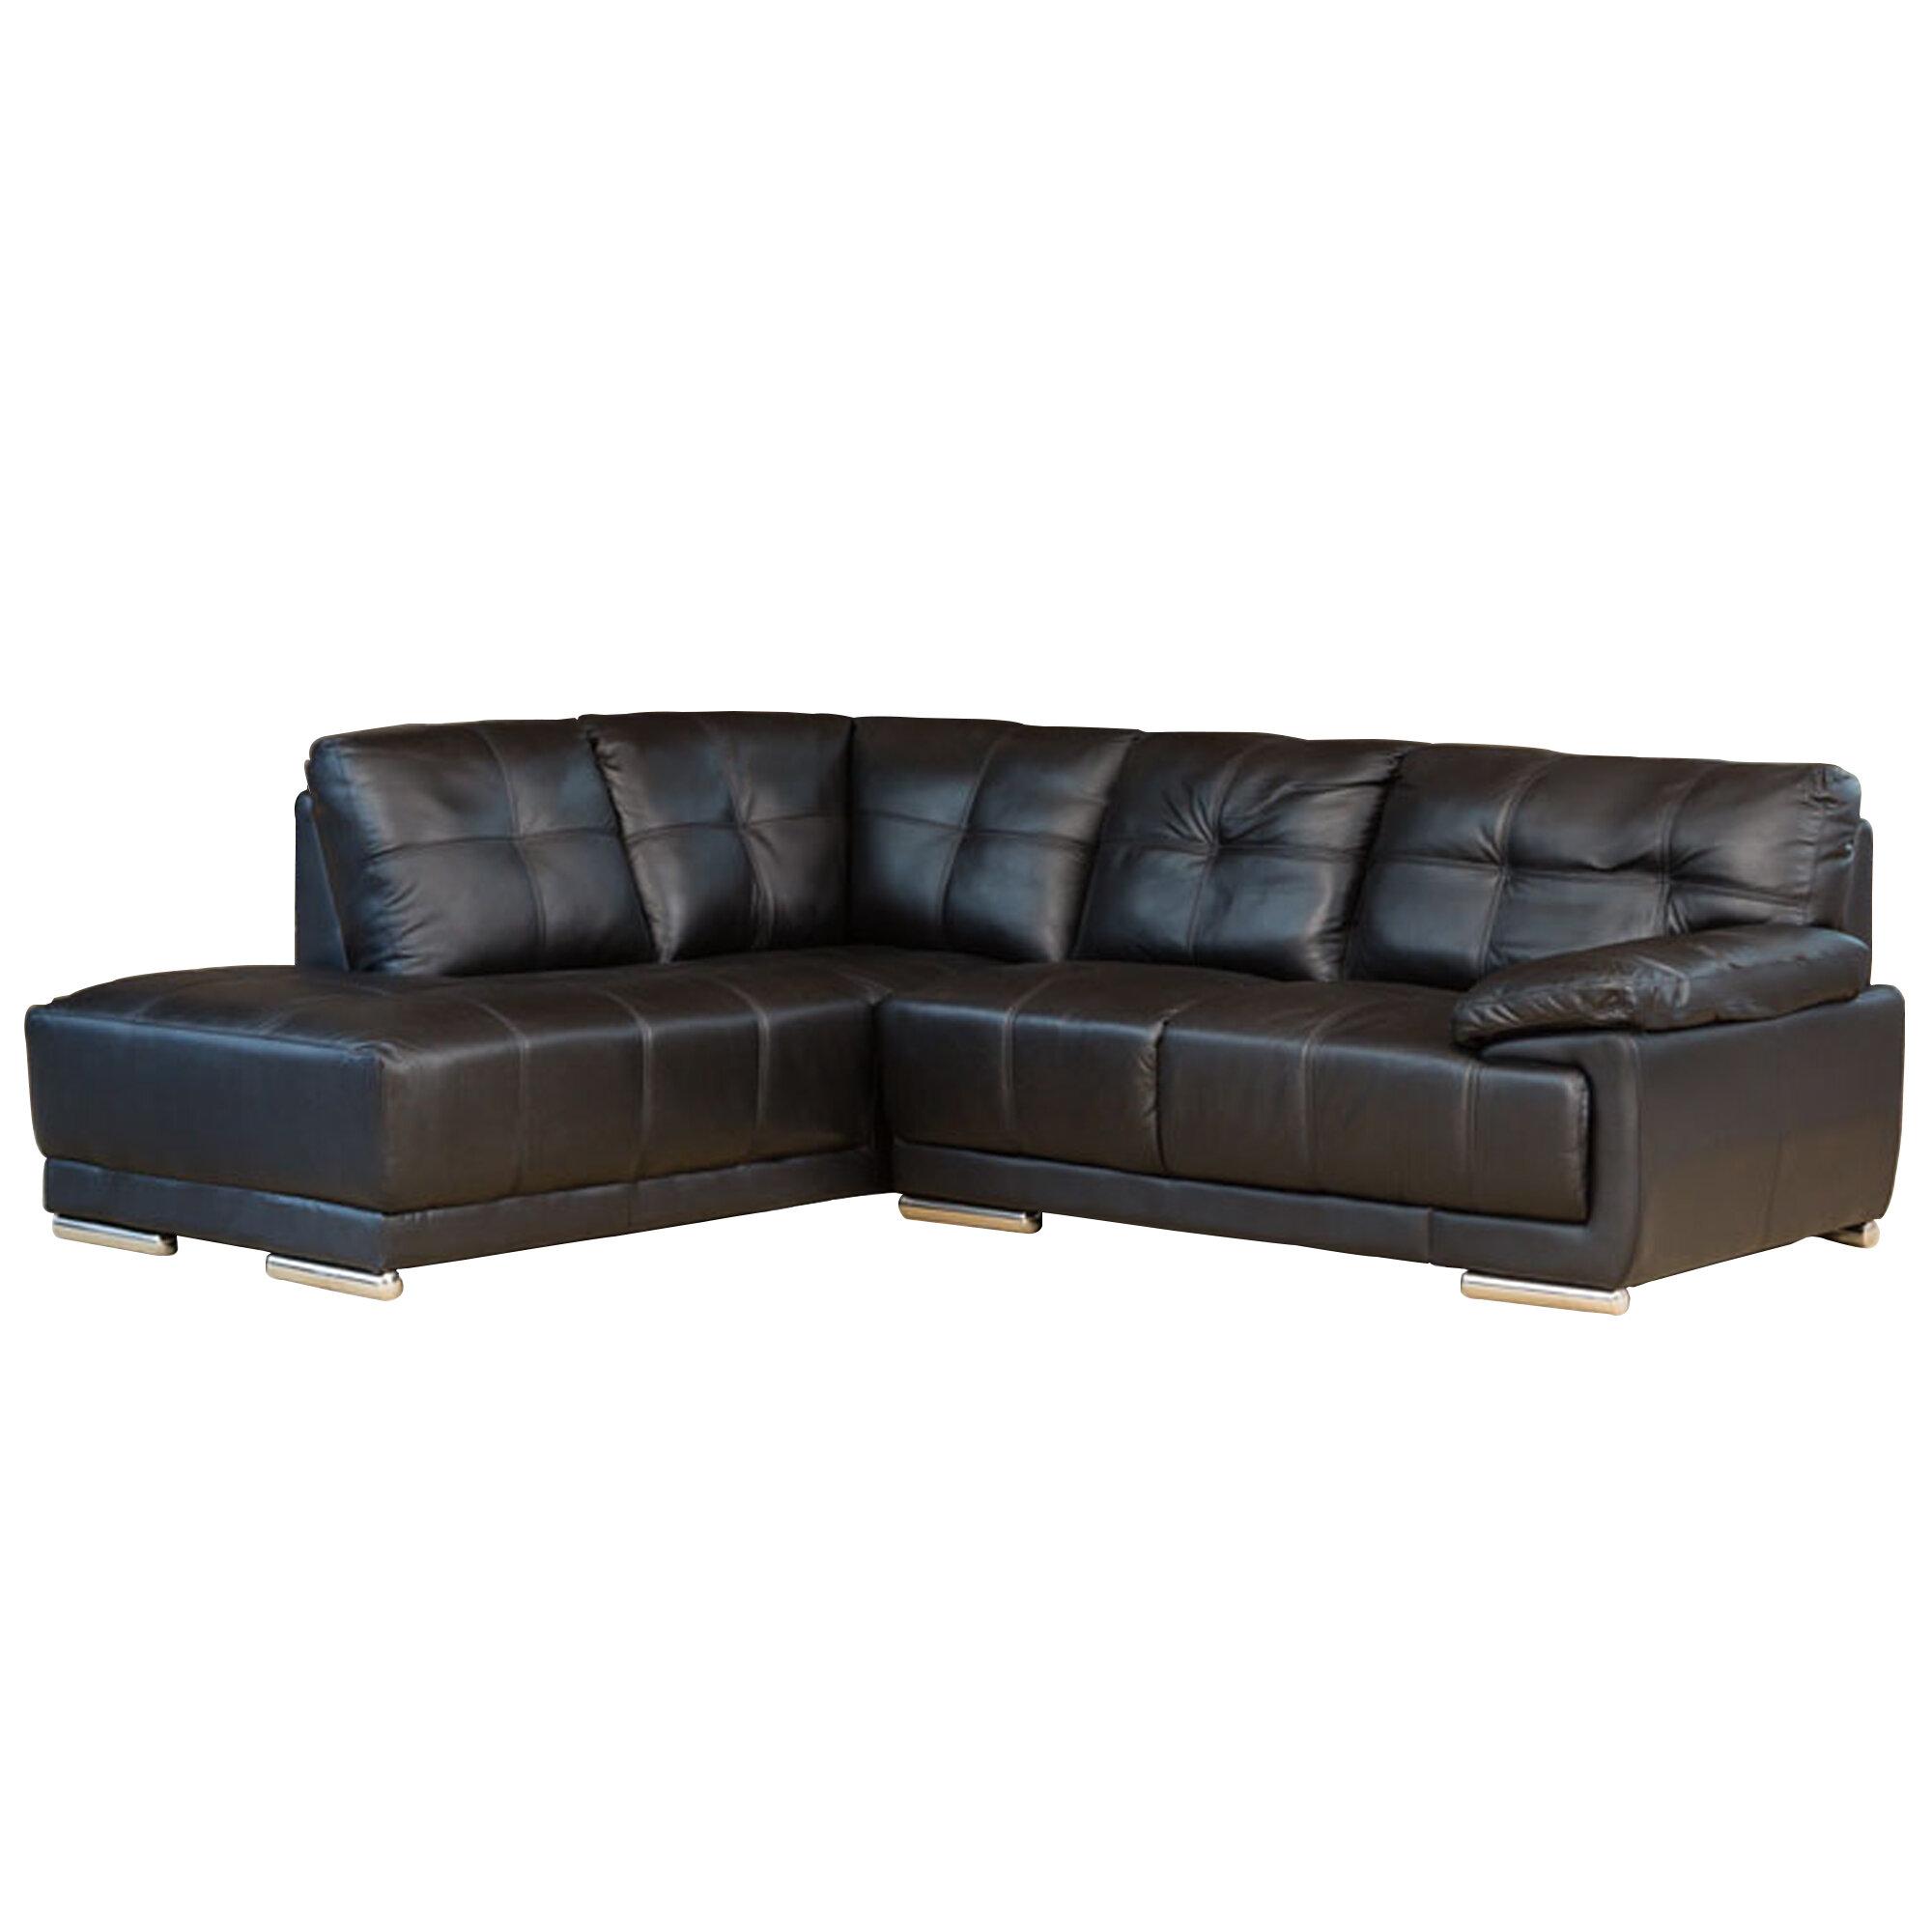 Maud Leather Modular Corner Sofa